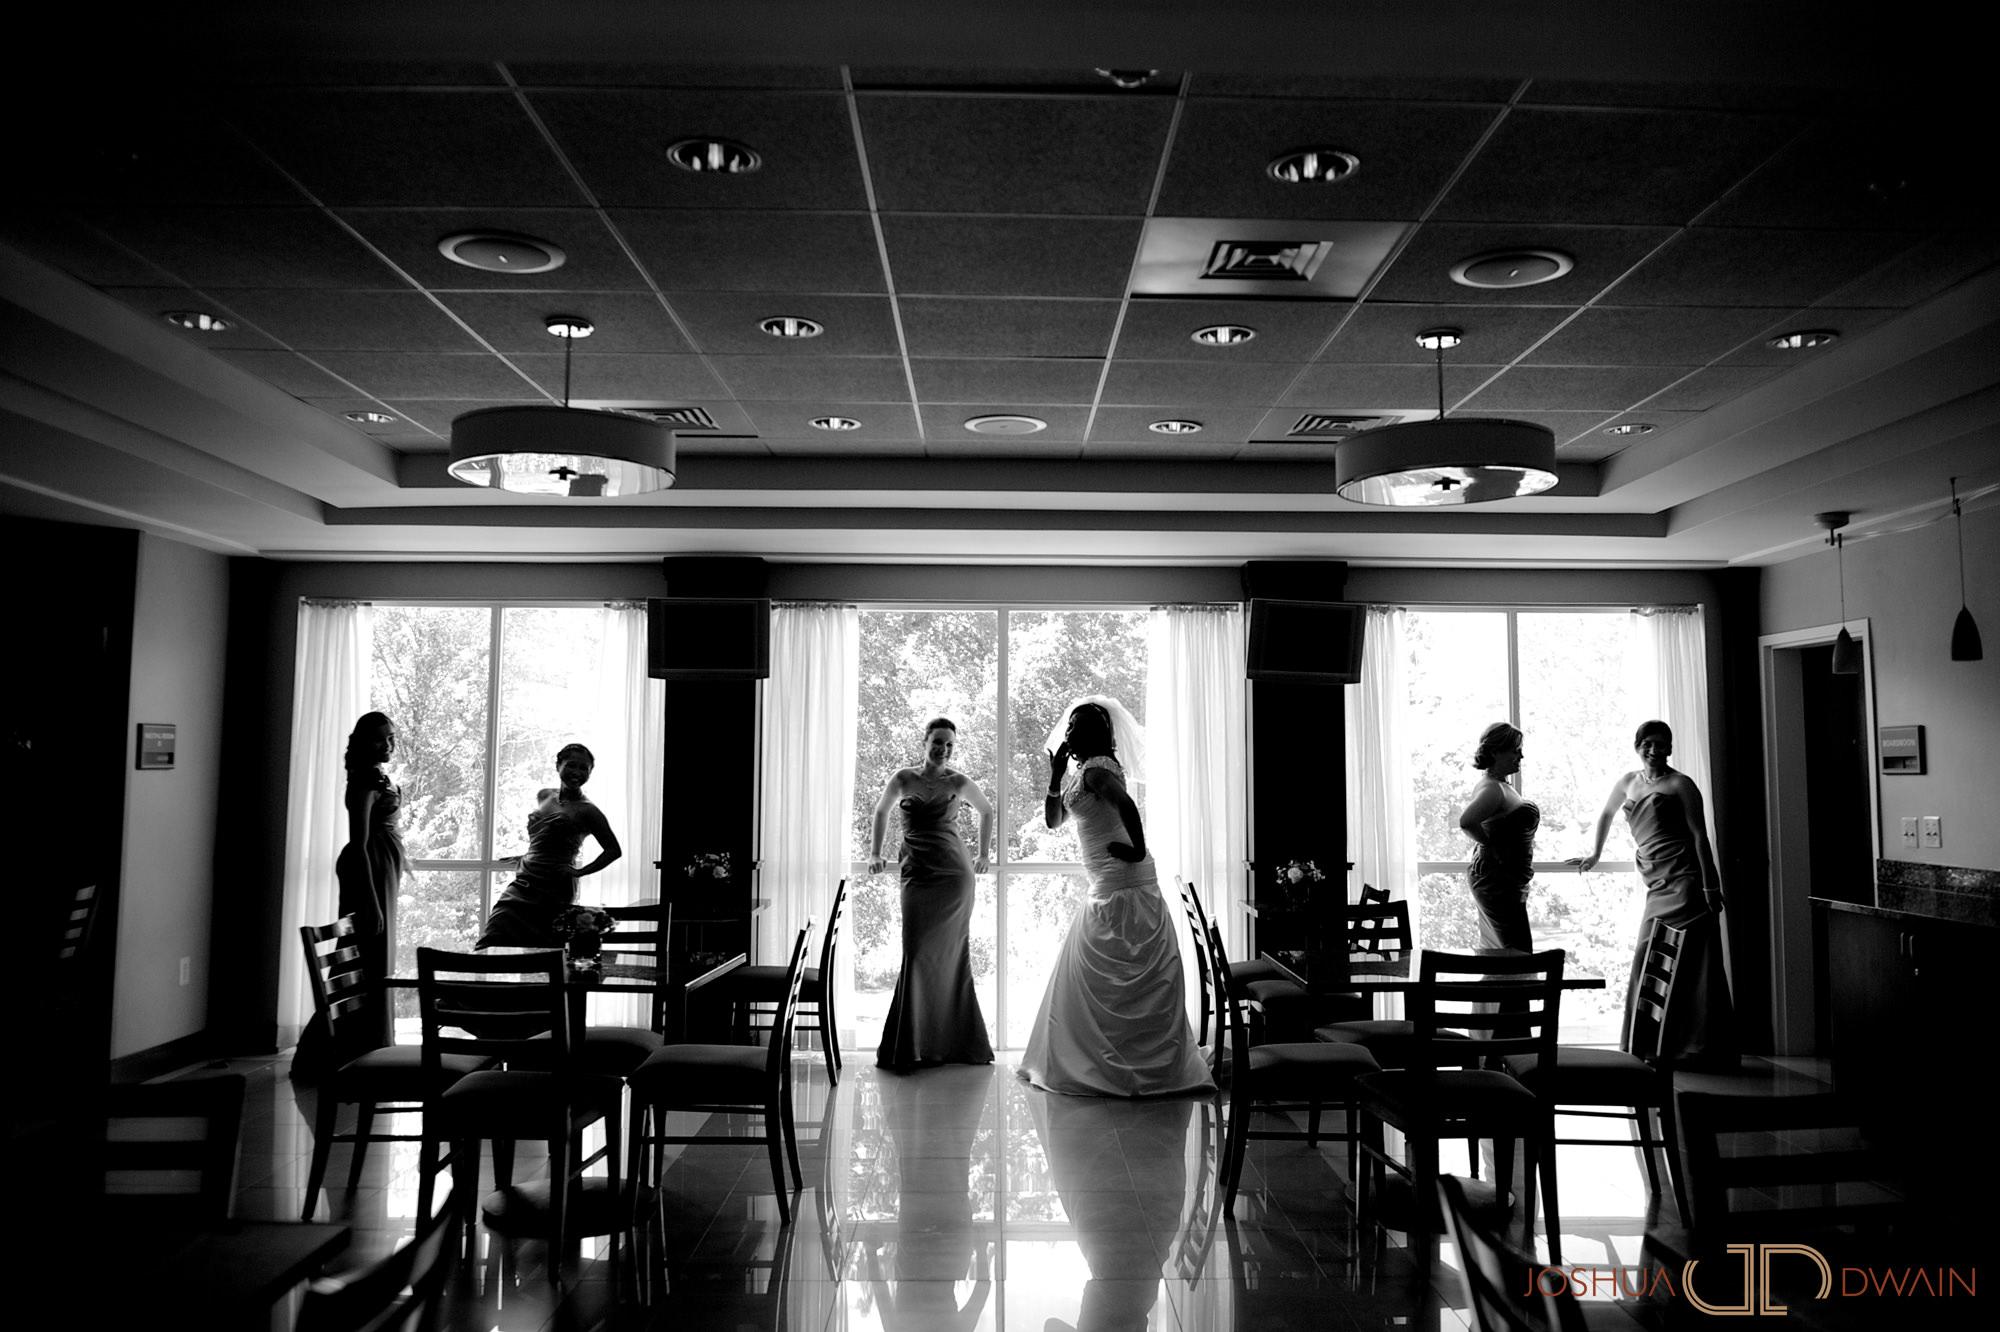 danielle-derek-006-the-imperia-somerset-new-jersey-wedding-photographer-joshua-dwain-danielle-derek-016-the-imperia-somerset-new-jerseywedding-photographer-joshua-dwain-2012-09-15_dd_127